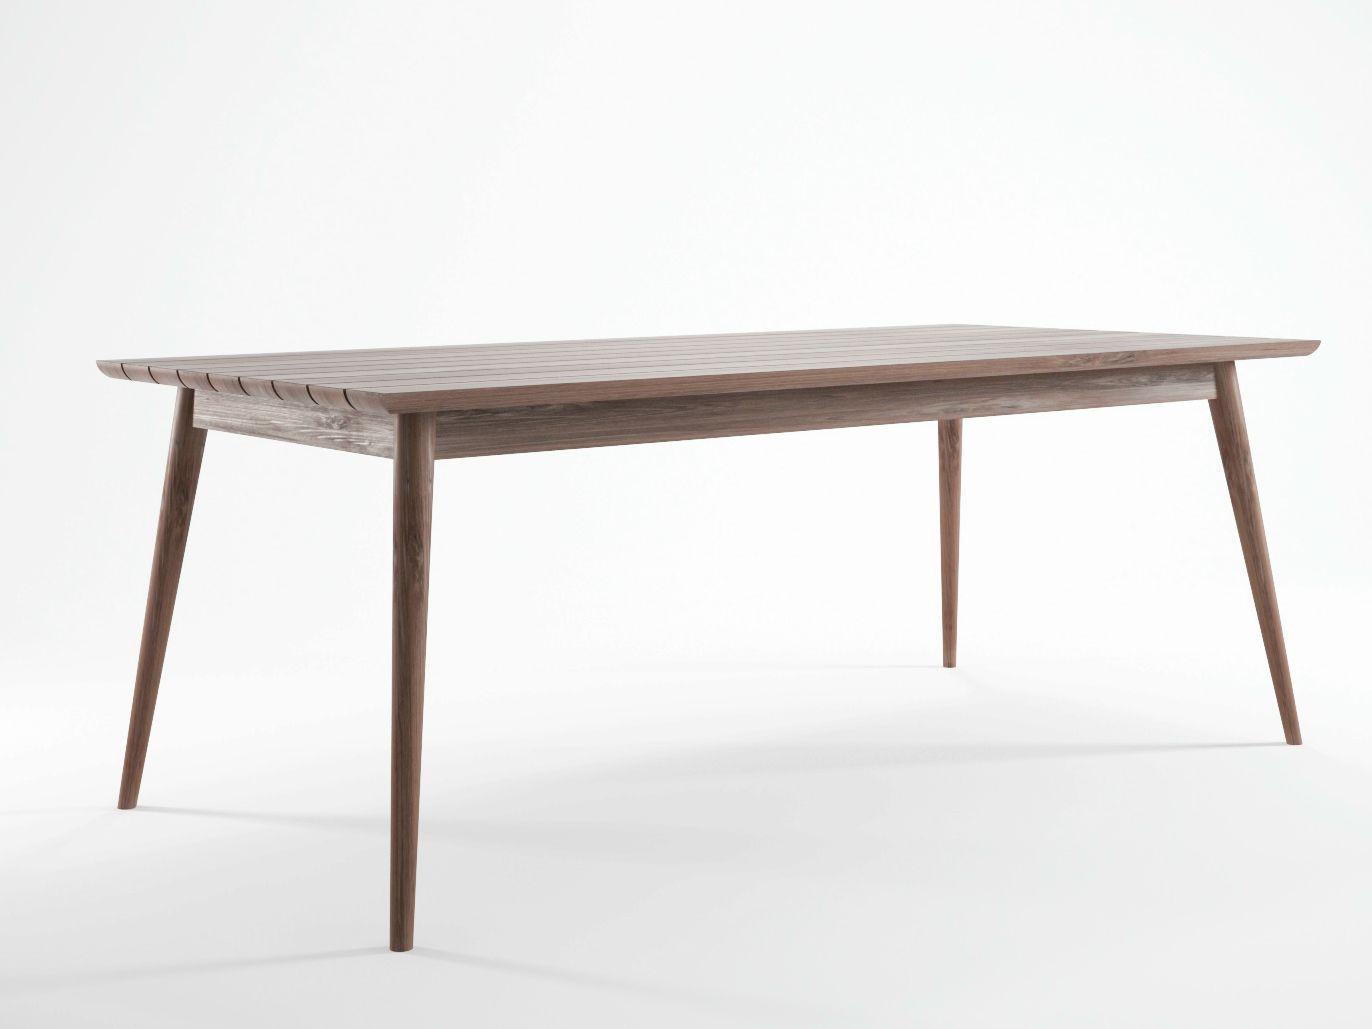 Vintage outdoor tavolo in stile scandinavo by karpenter - Tavolo stile scandinavo ...